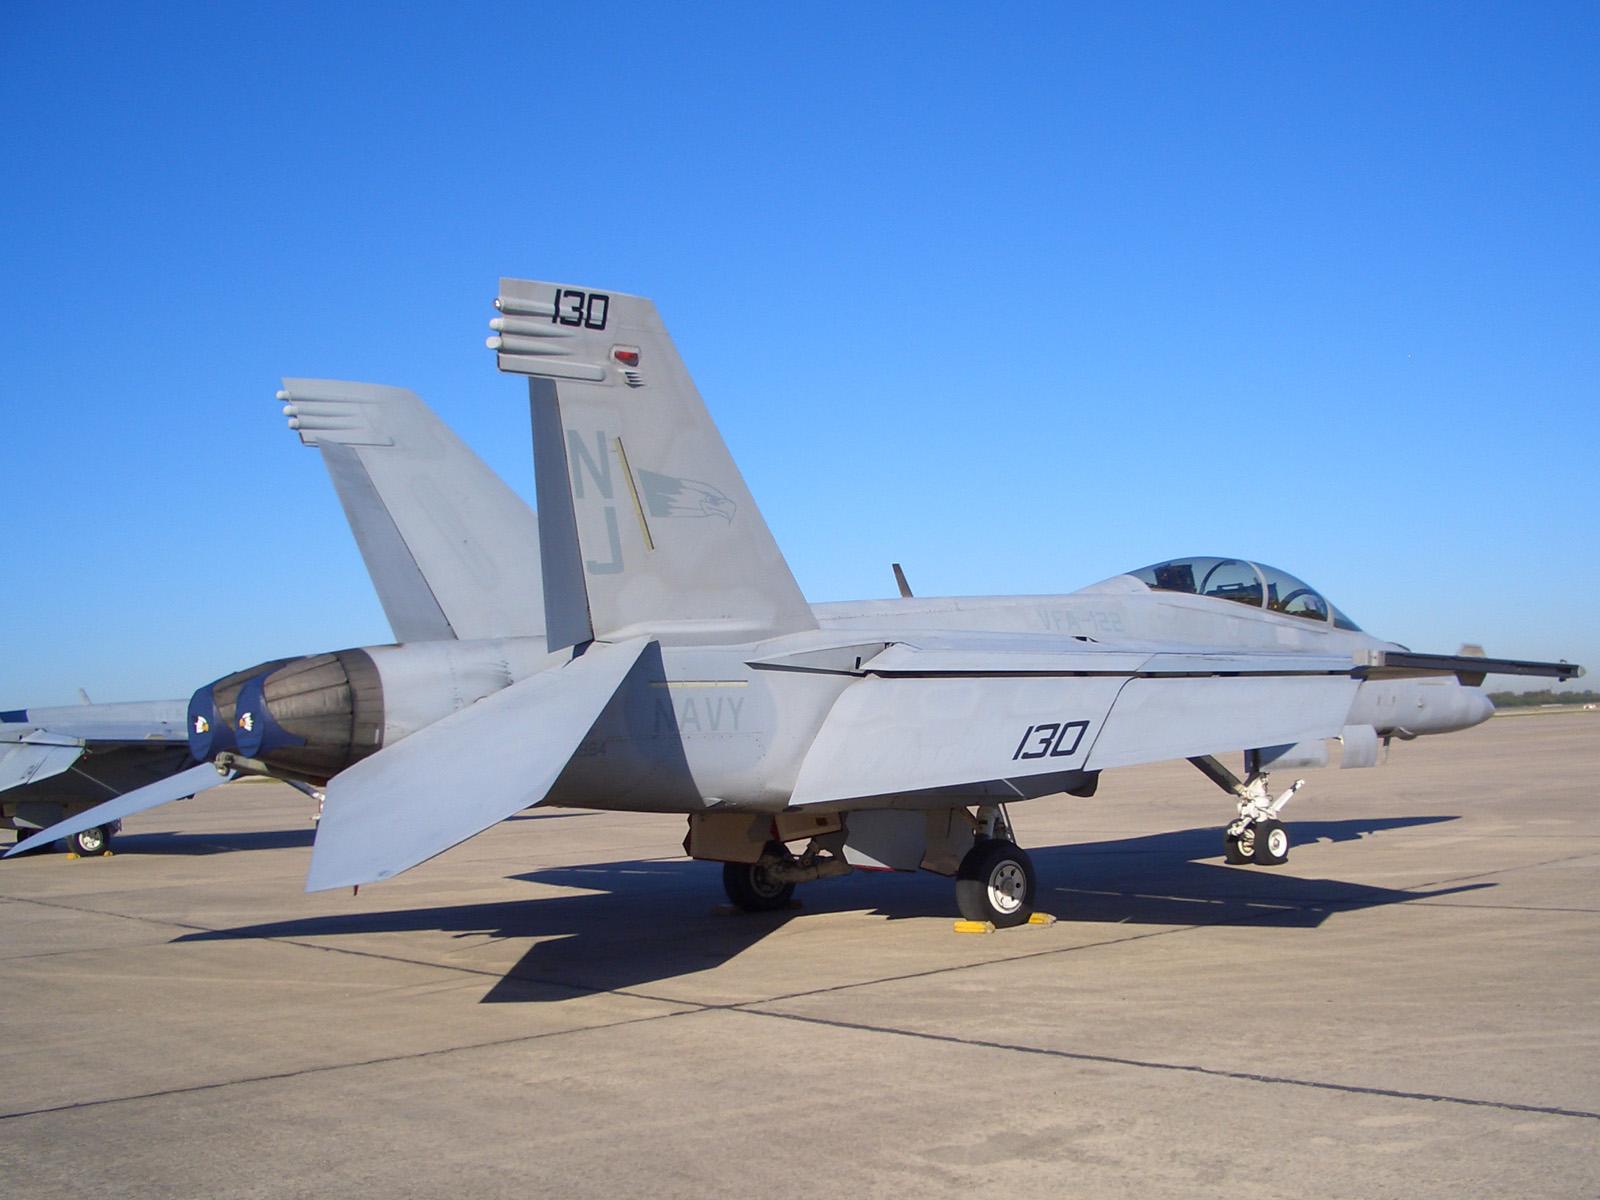 雷克蘭空軍基地:F-18大黃蜂戰鬥機   Alfred's Cave